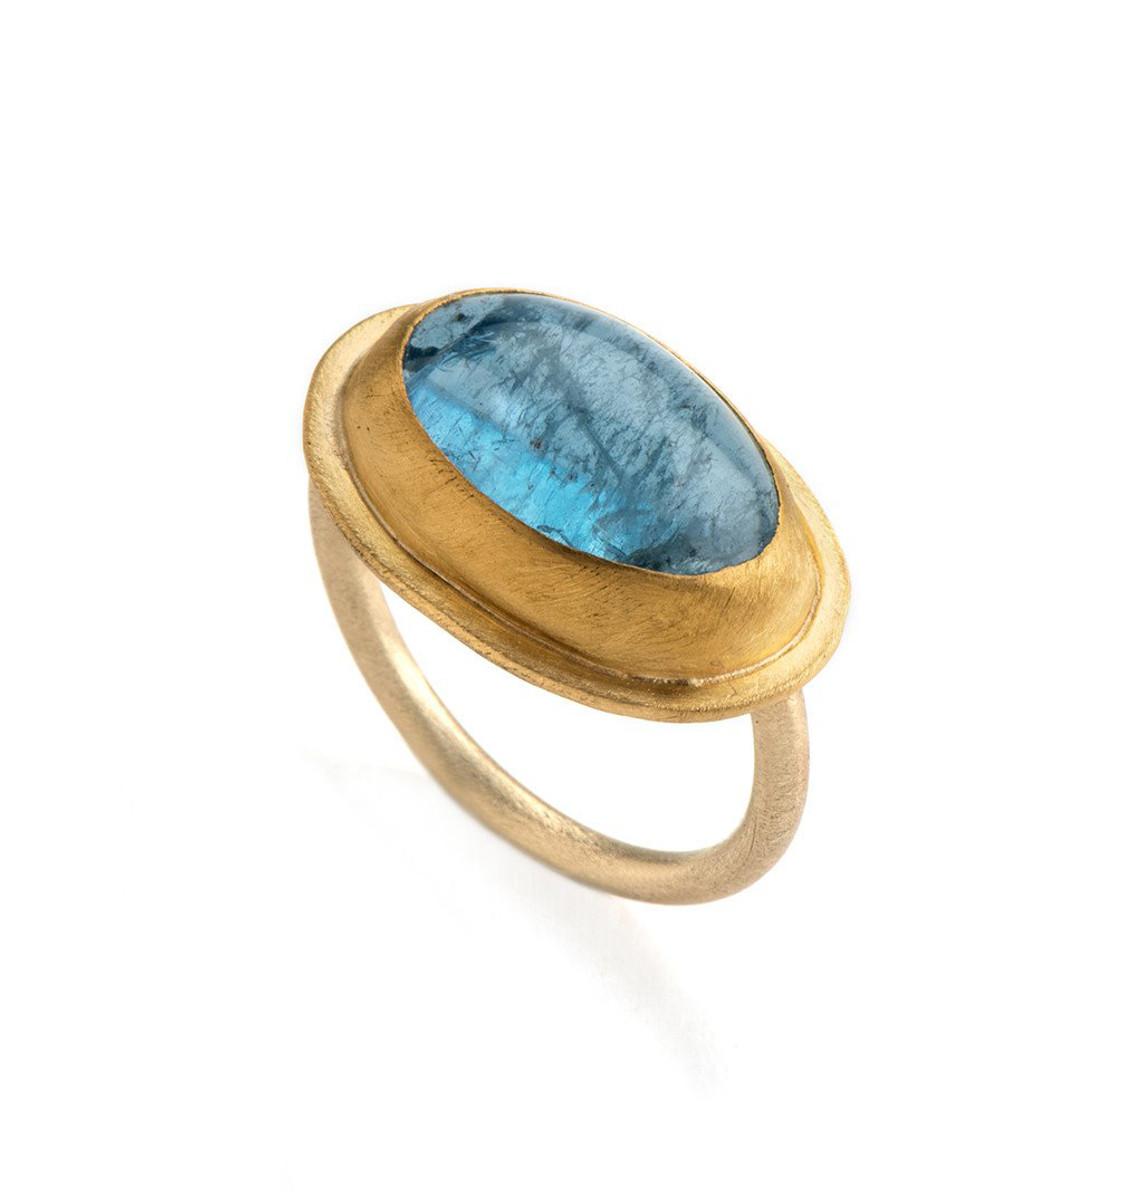 Bright Sky Aquamarine Gold Ring by Nava Zahavi - New Arrival